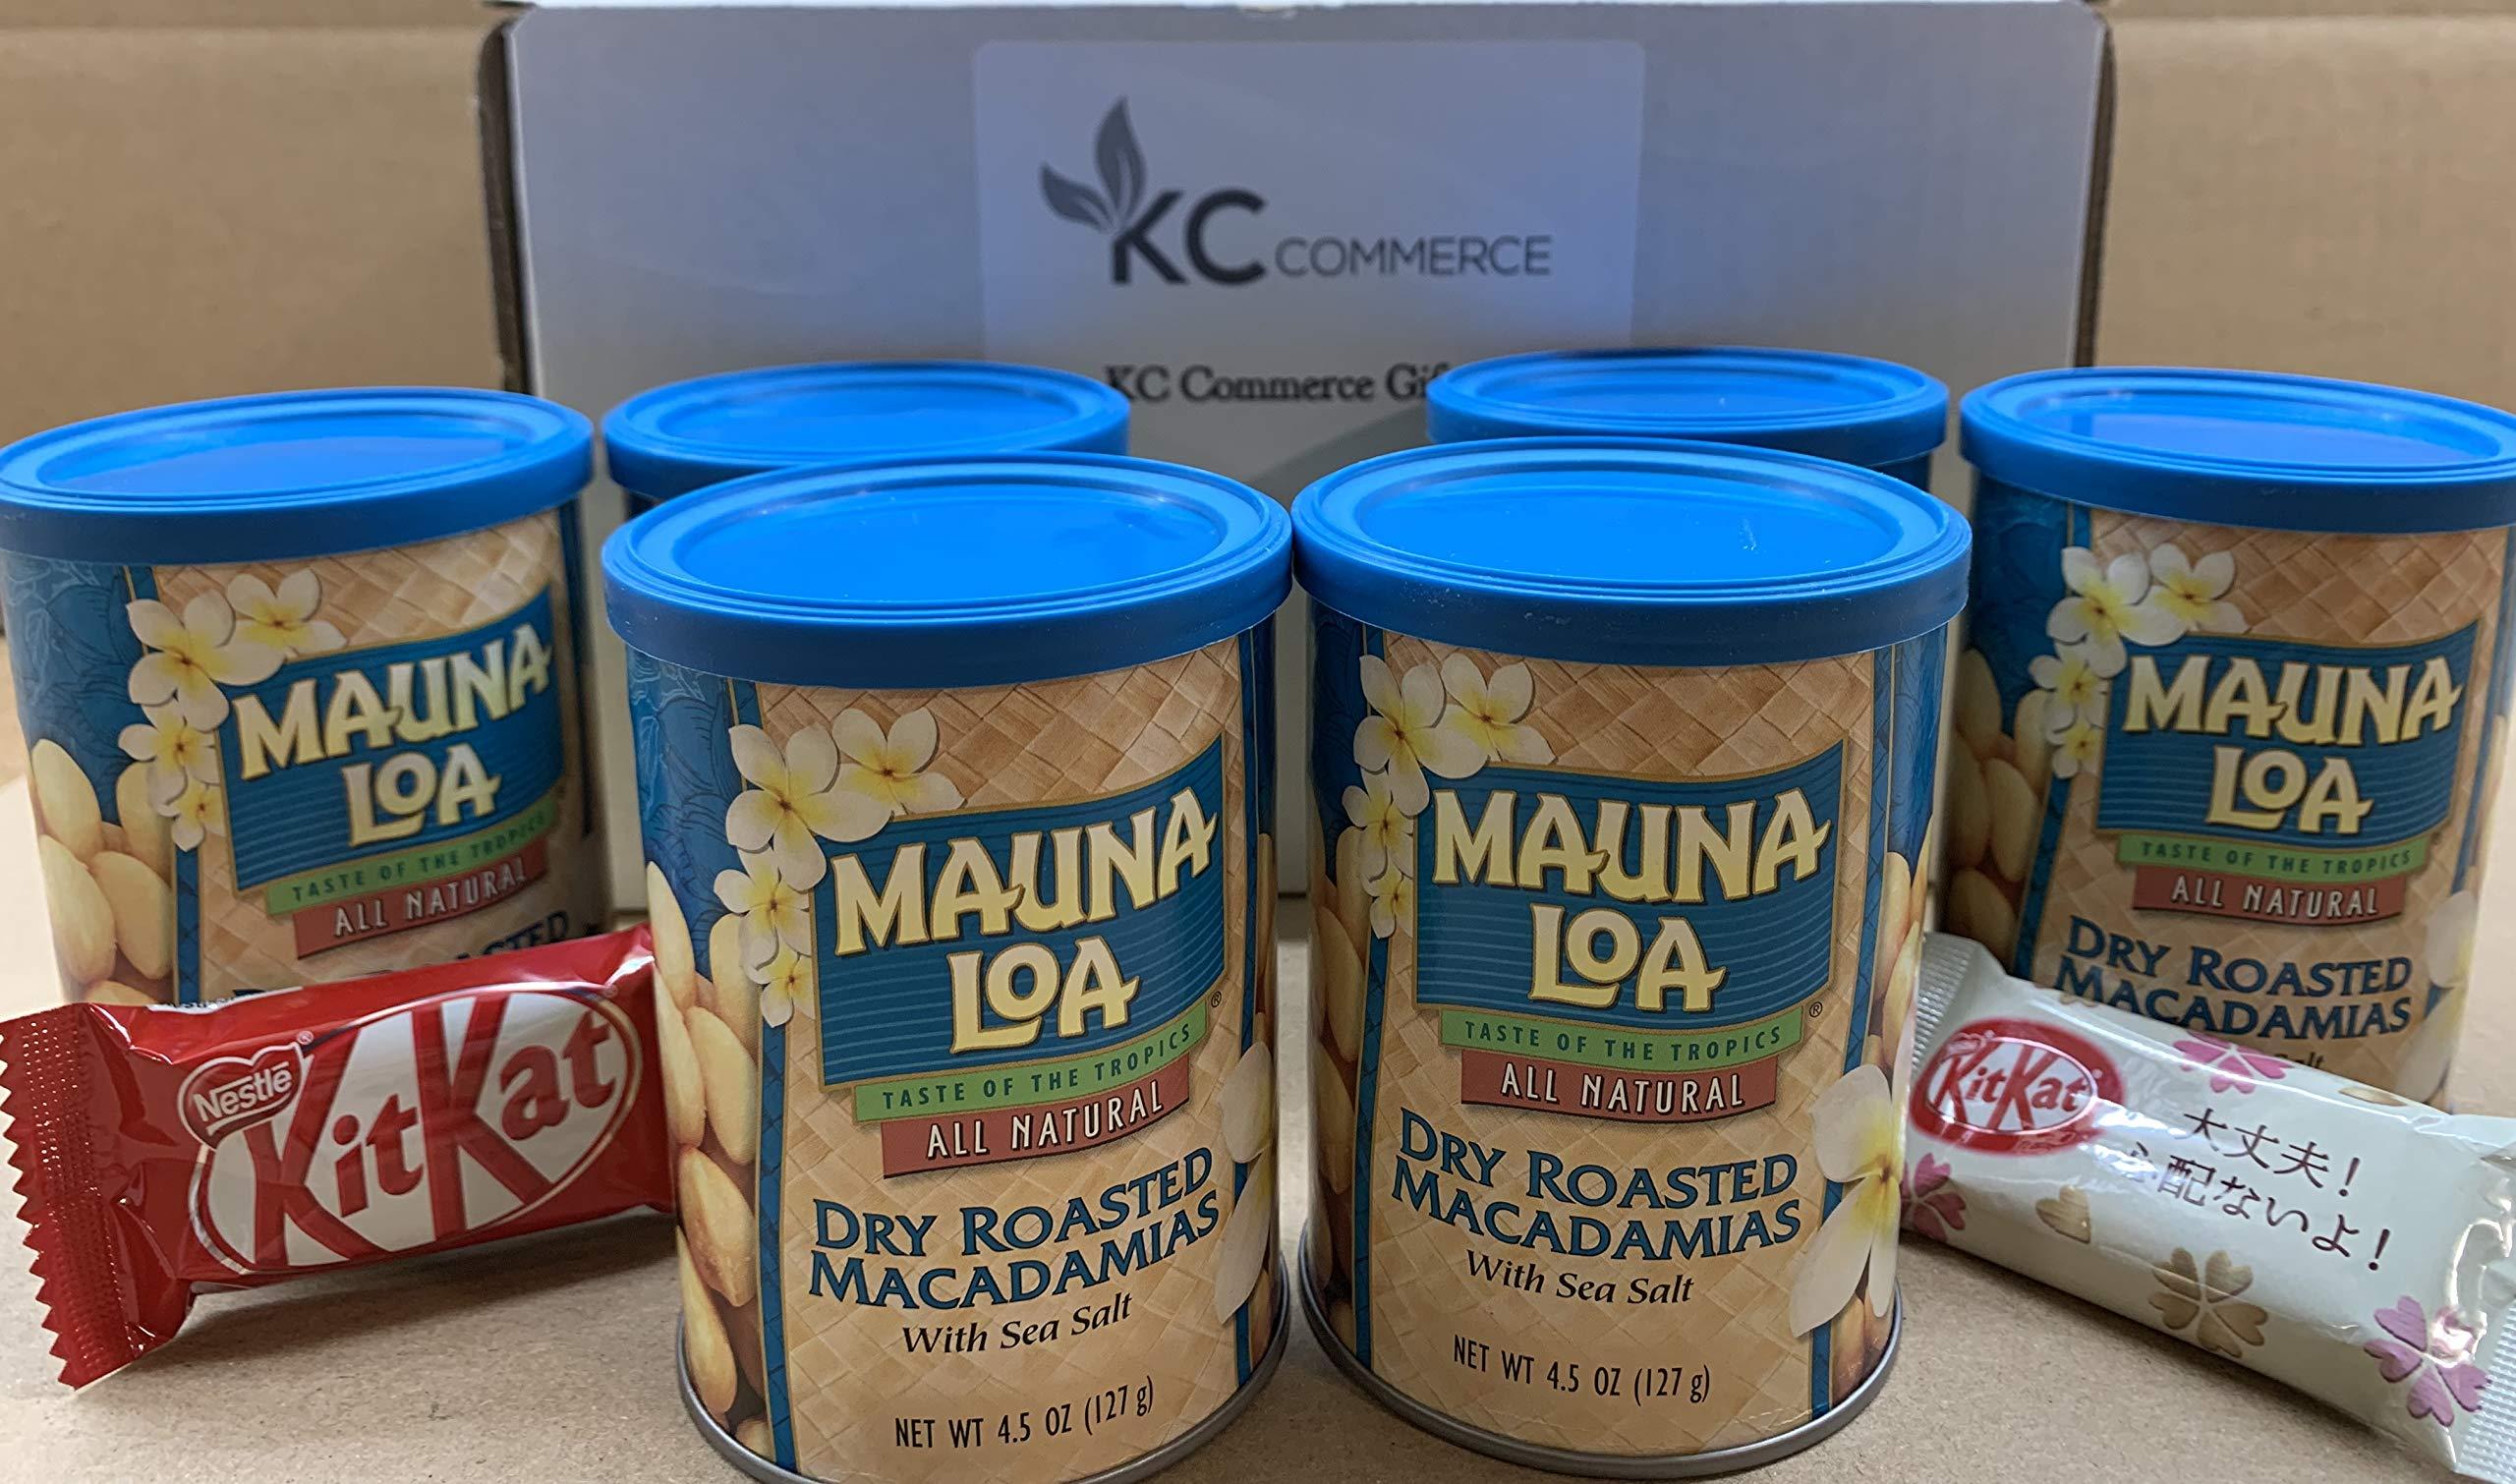 Mauna Loa Dry Roasted Macadamia Nut With Sea Salt 4.5 Ounce Pack of 6 by KC Commerce